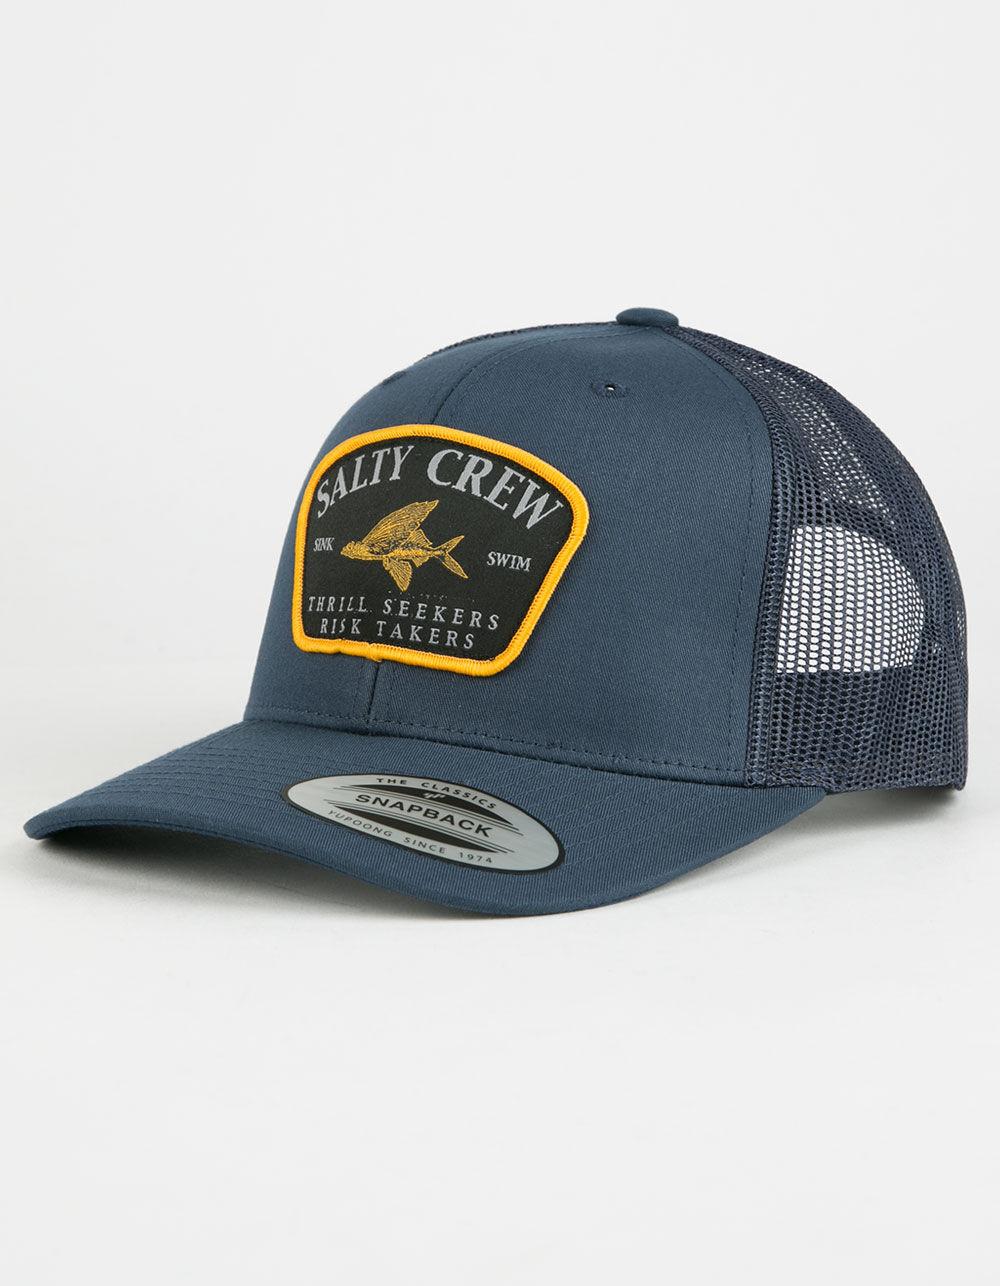 SALTY CREW Leeward Trucker Hat